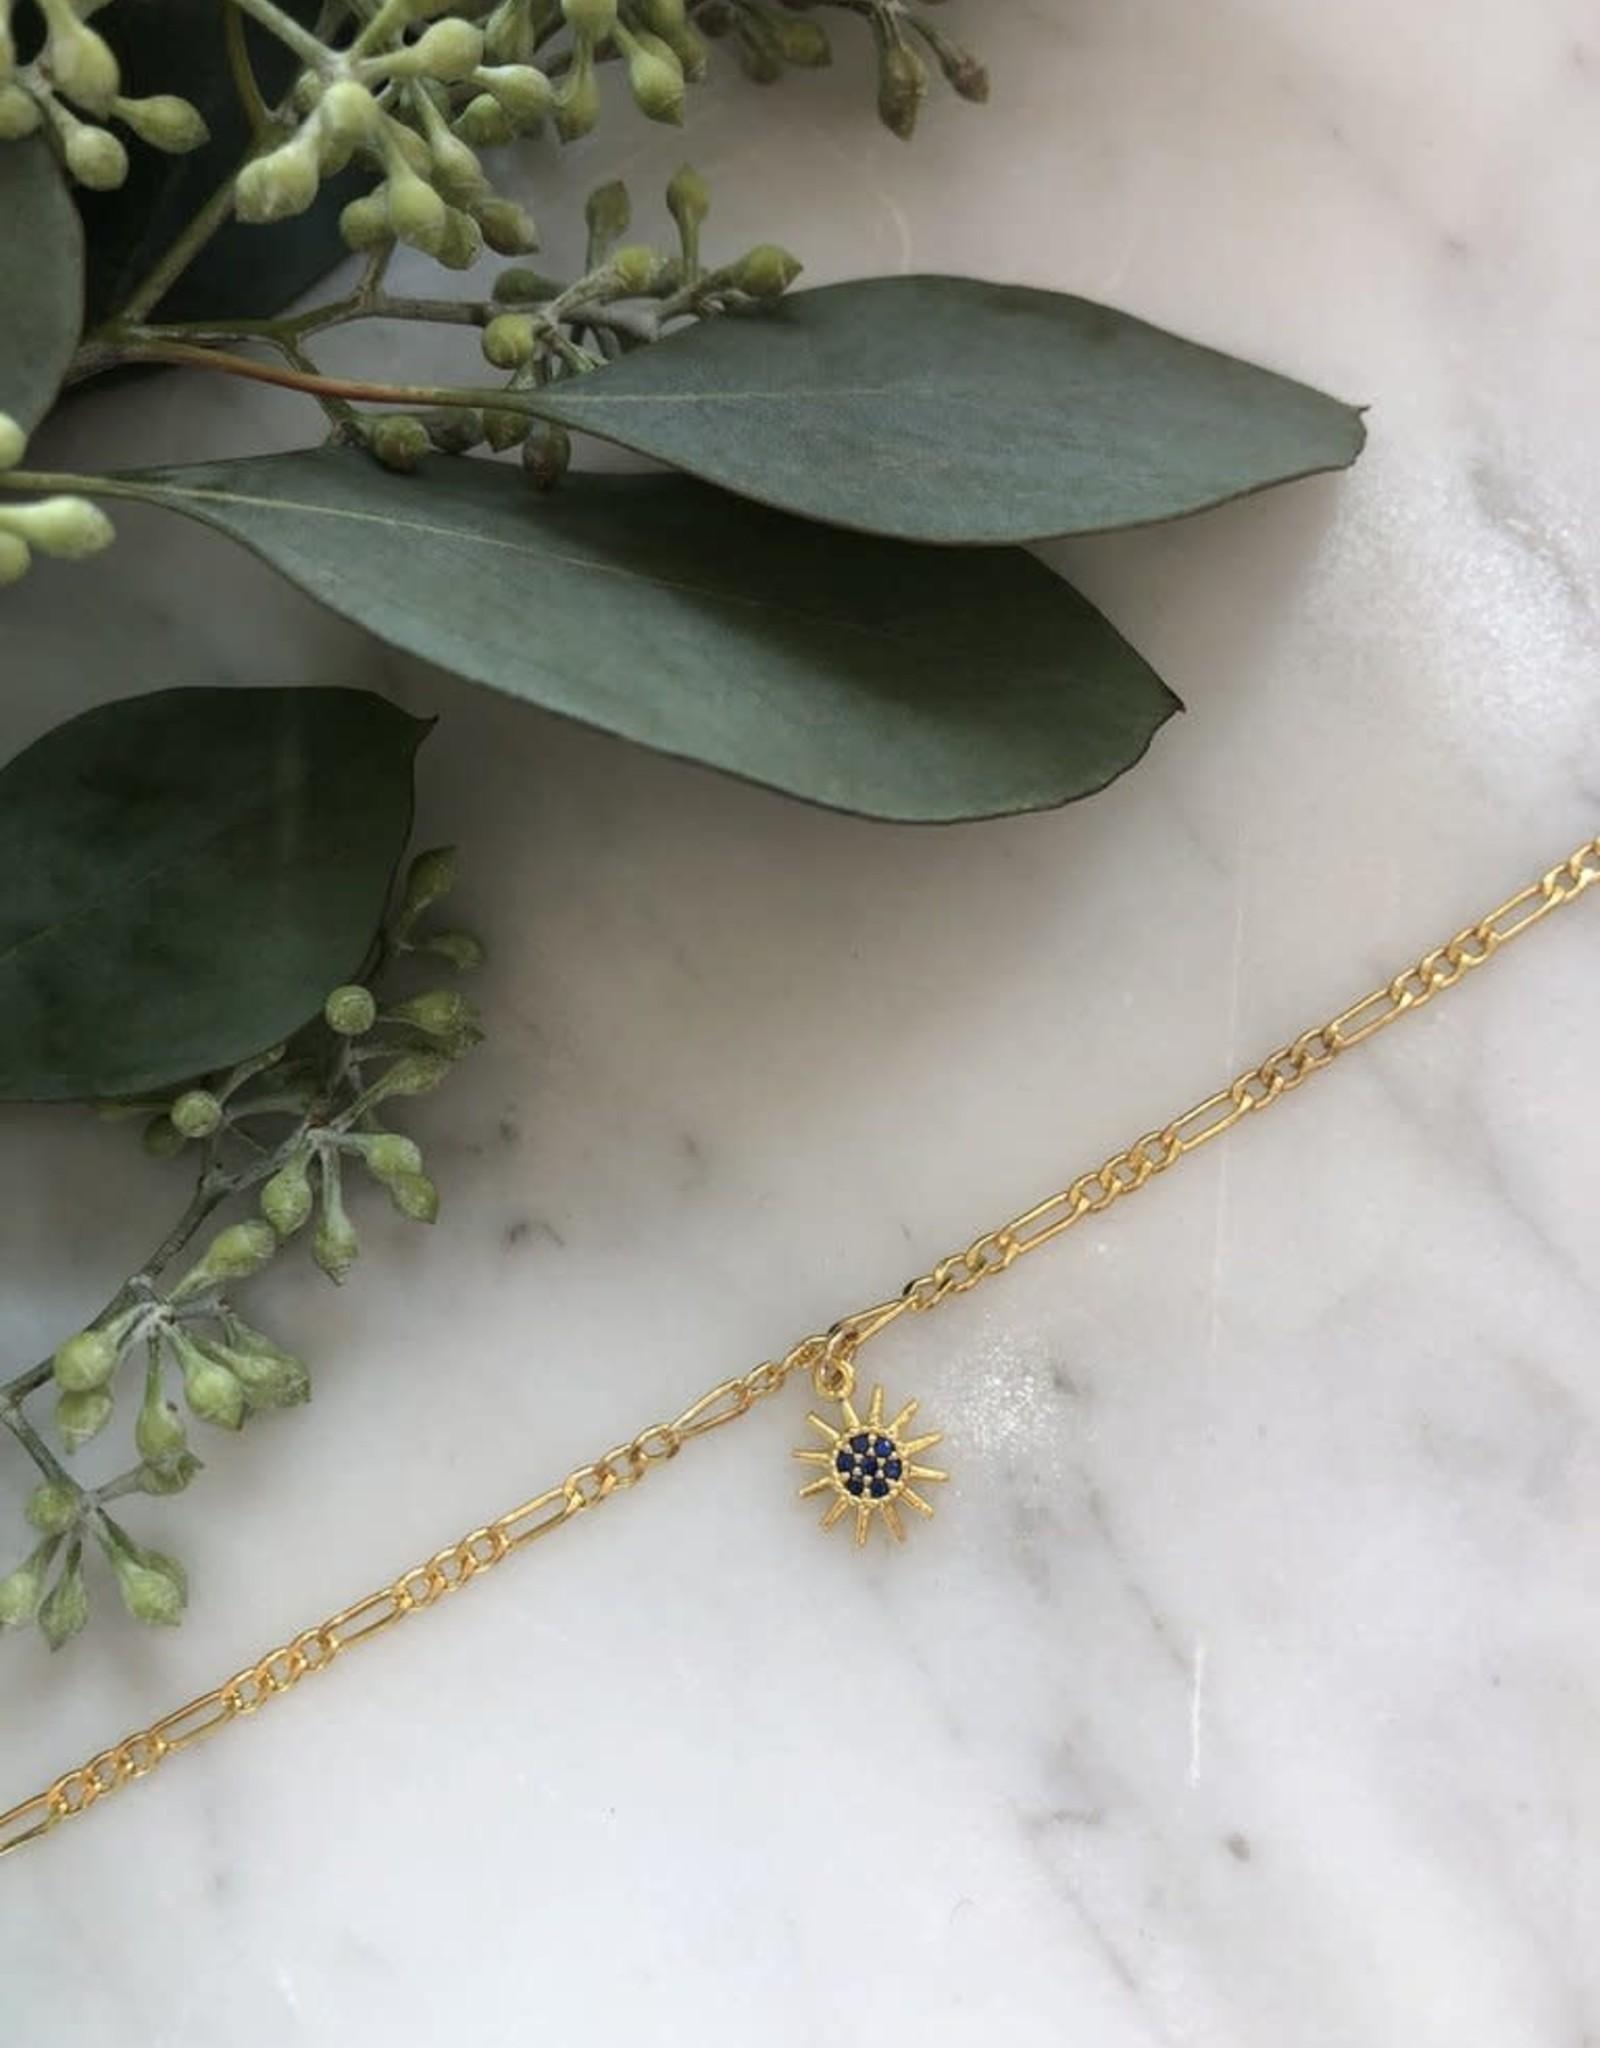 Flora Ciccarelli Bracelet chaîne figaro et soleil (219-001)